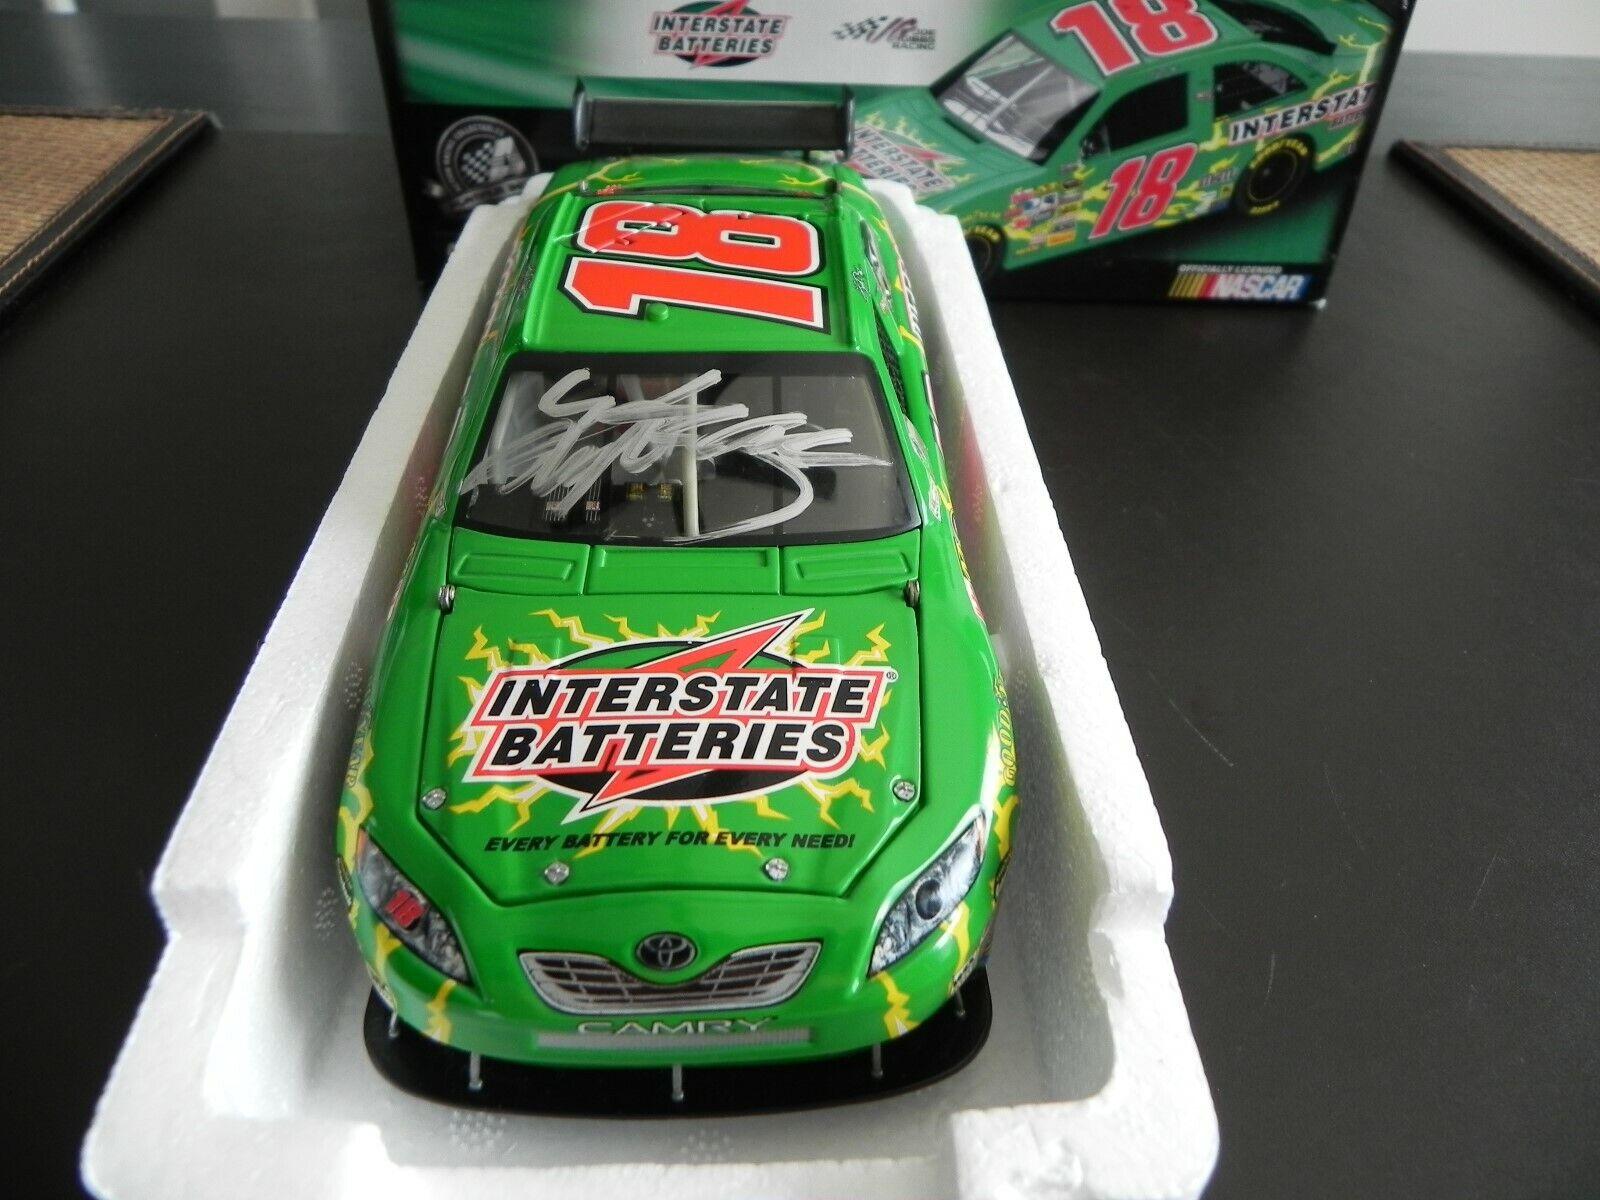 NASCAR AUTOGRAPHED KYLE BUSCH 2008  18 INTERSTATE BATTERIES COT DIECAST